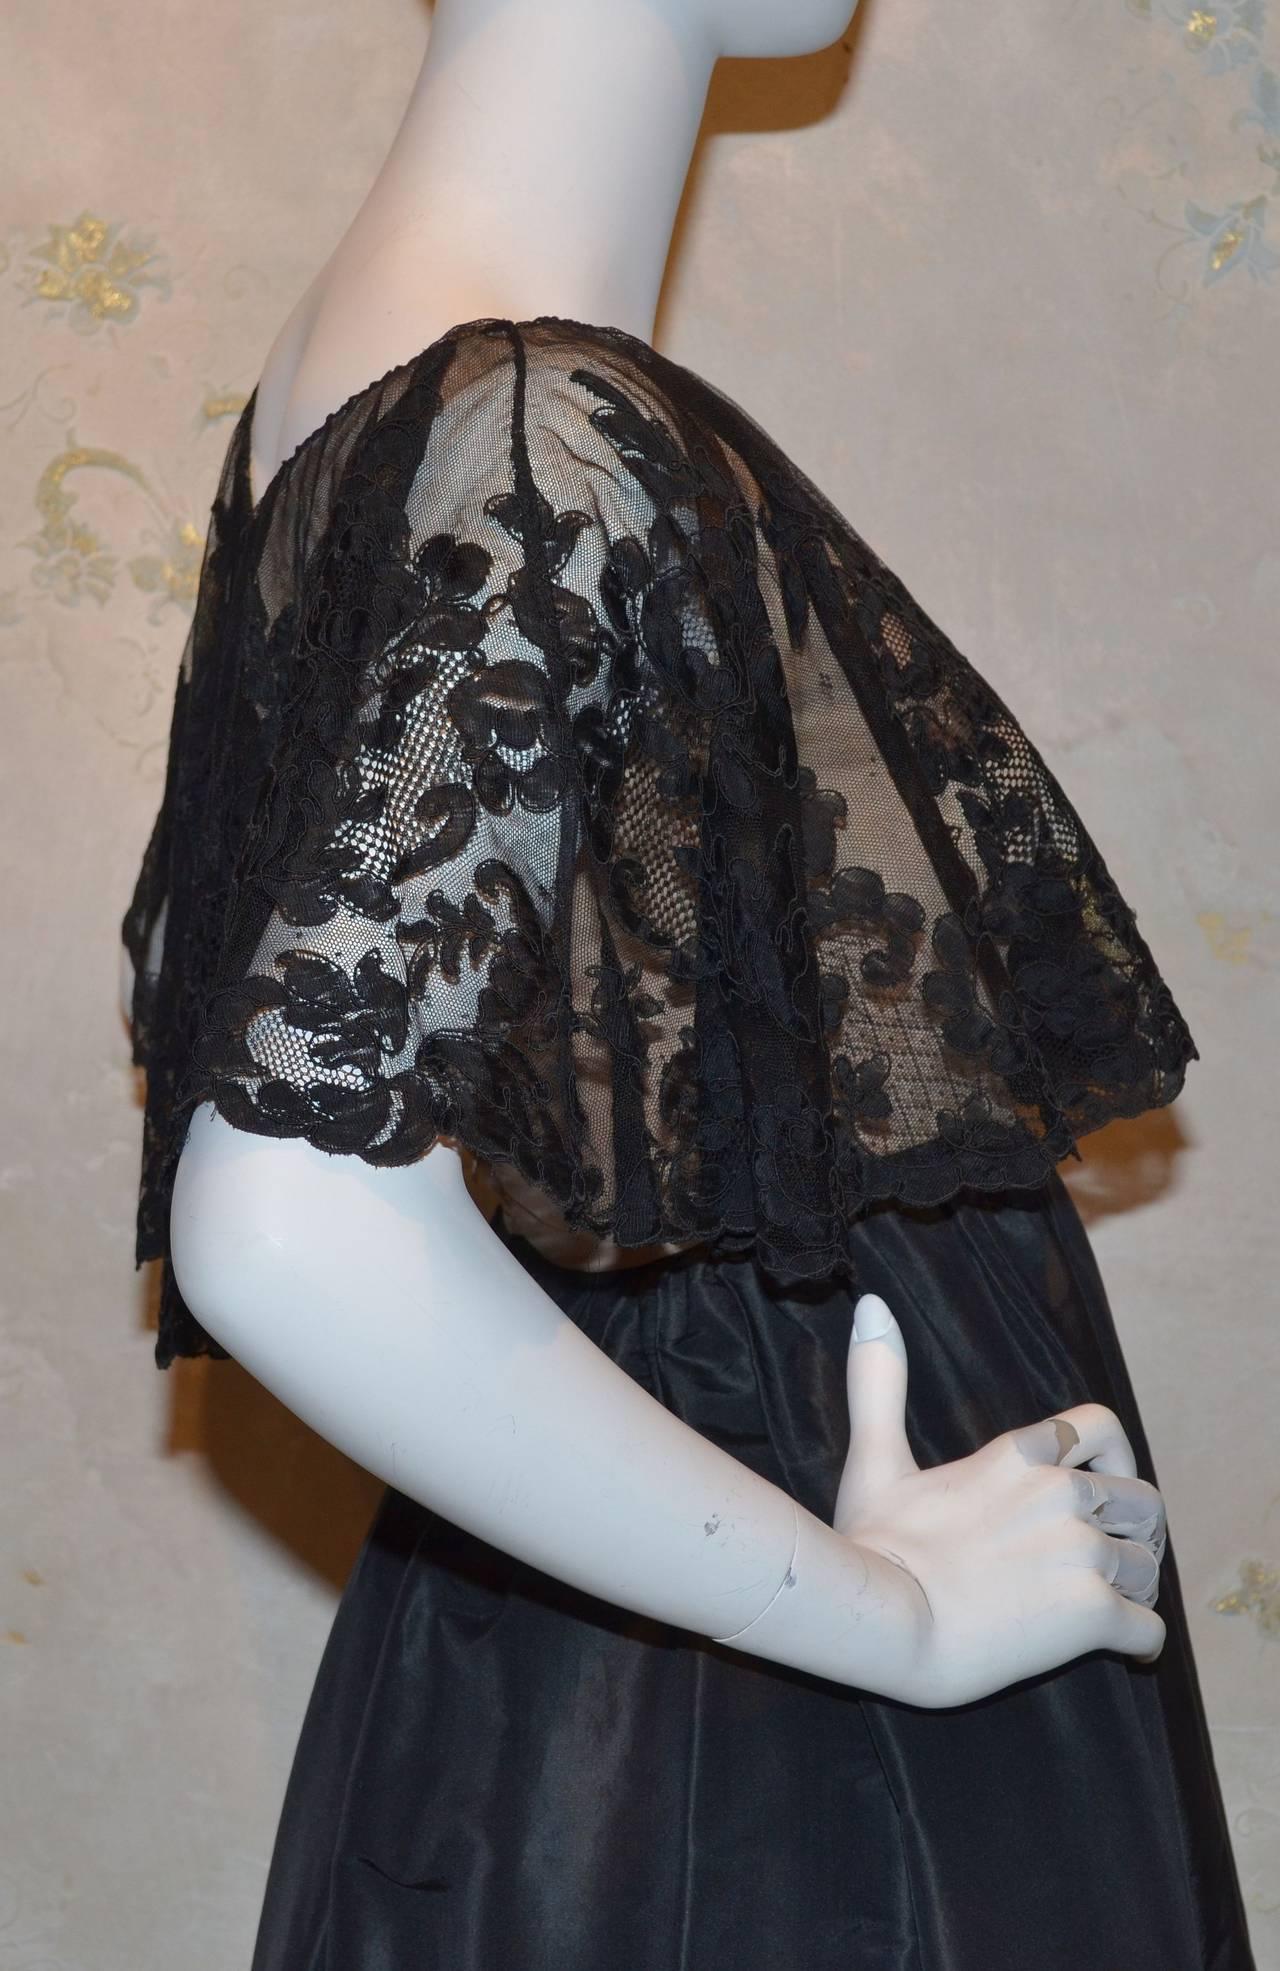 Vinage Oscar de la Renta Black Lace Overlay Peasant Dress In Excellent Condition For Sale In Carmel by the Sea, CA